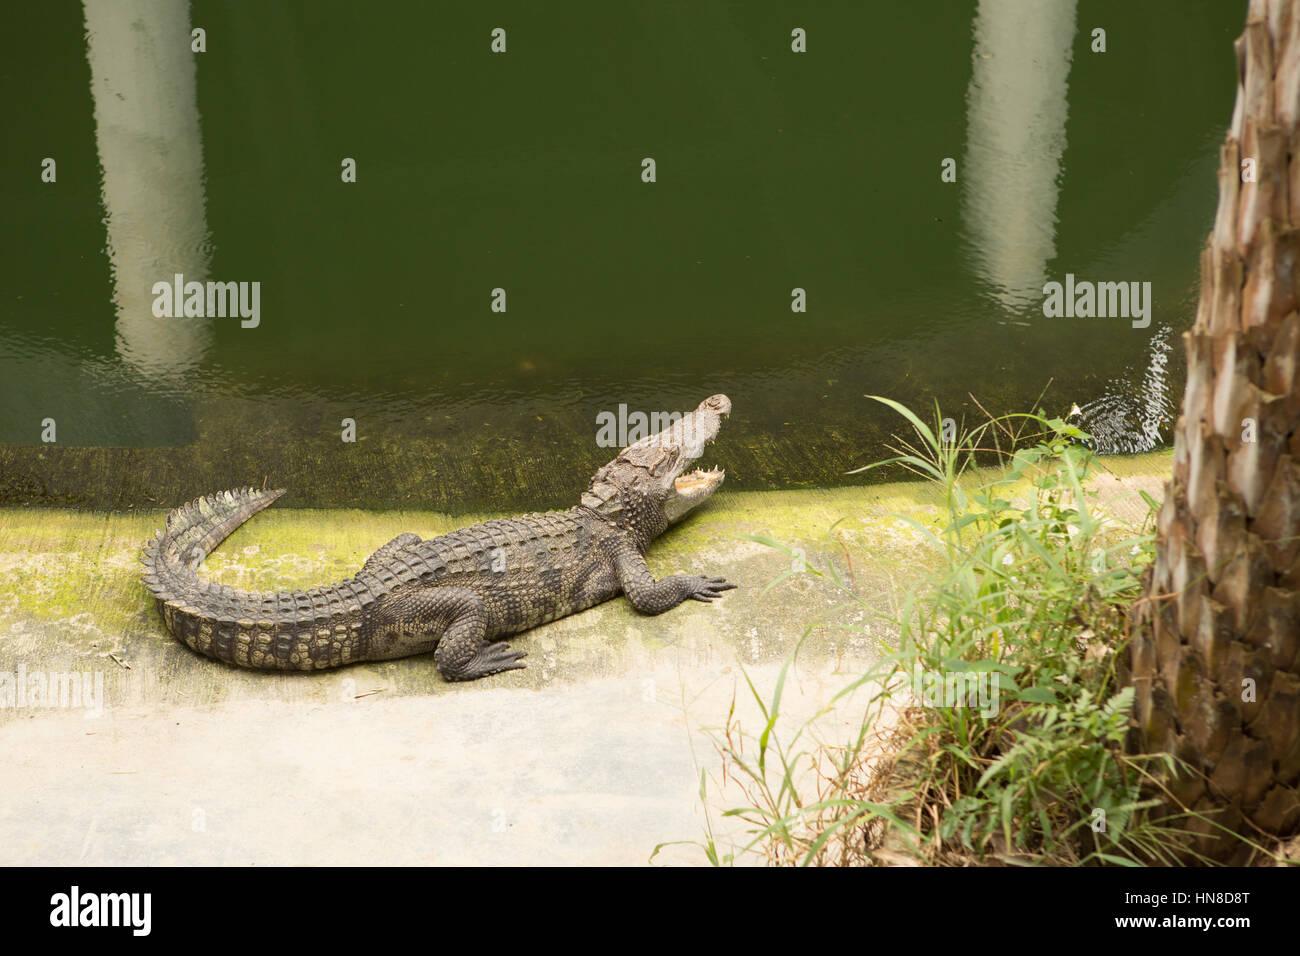 THAILAND Crocodile Farm and Zoo - Stock Image